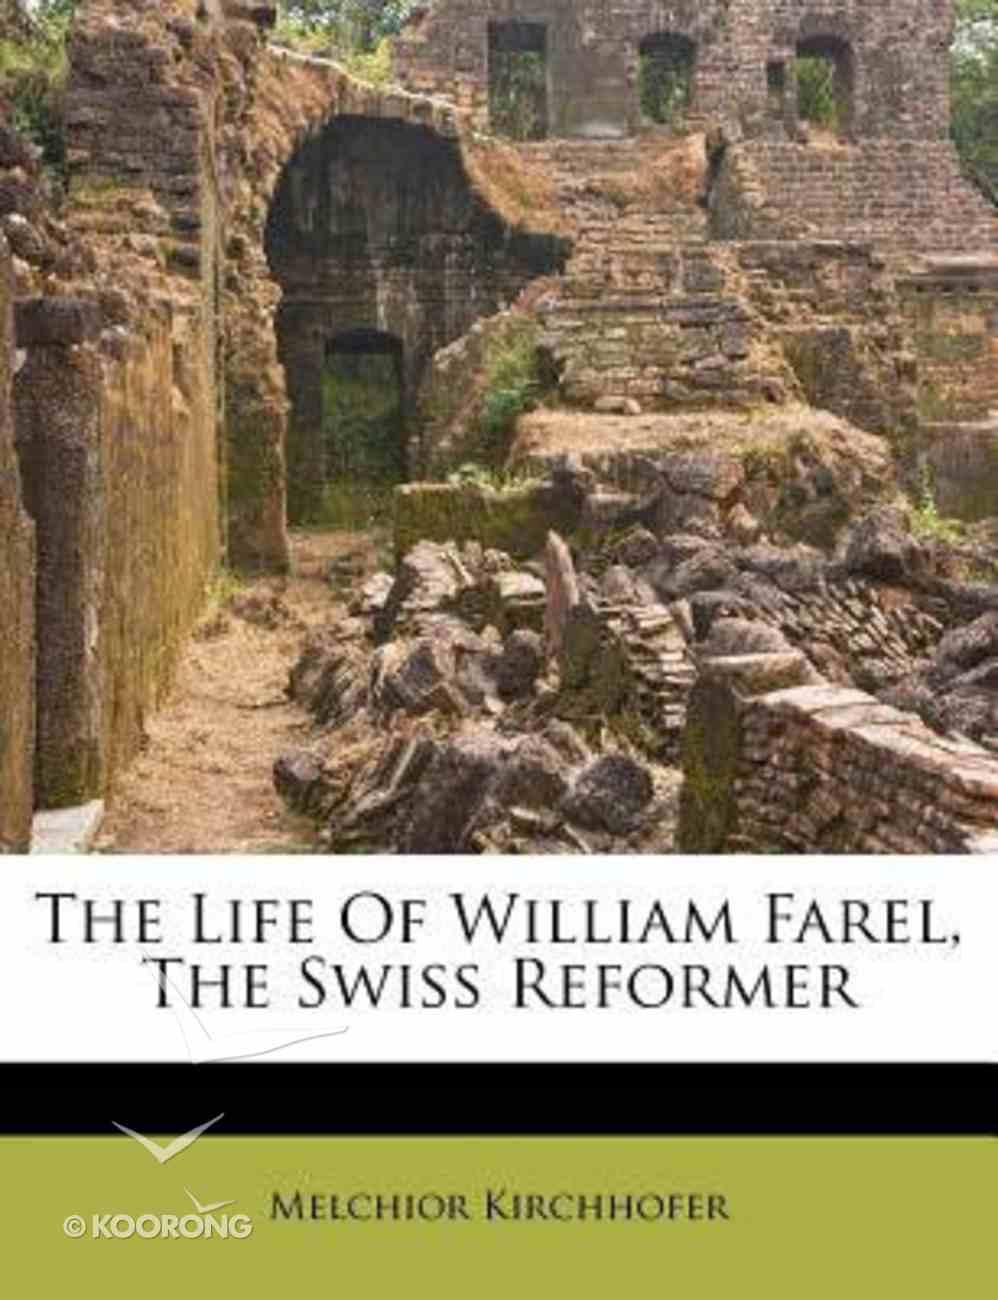 The Life of William Farel Paperback